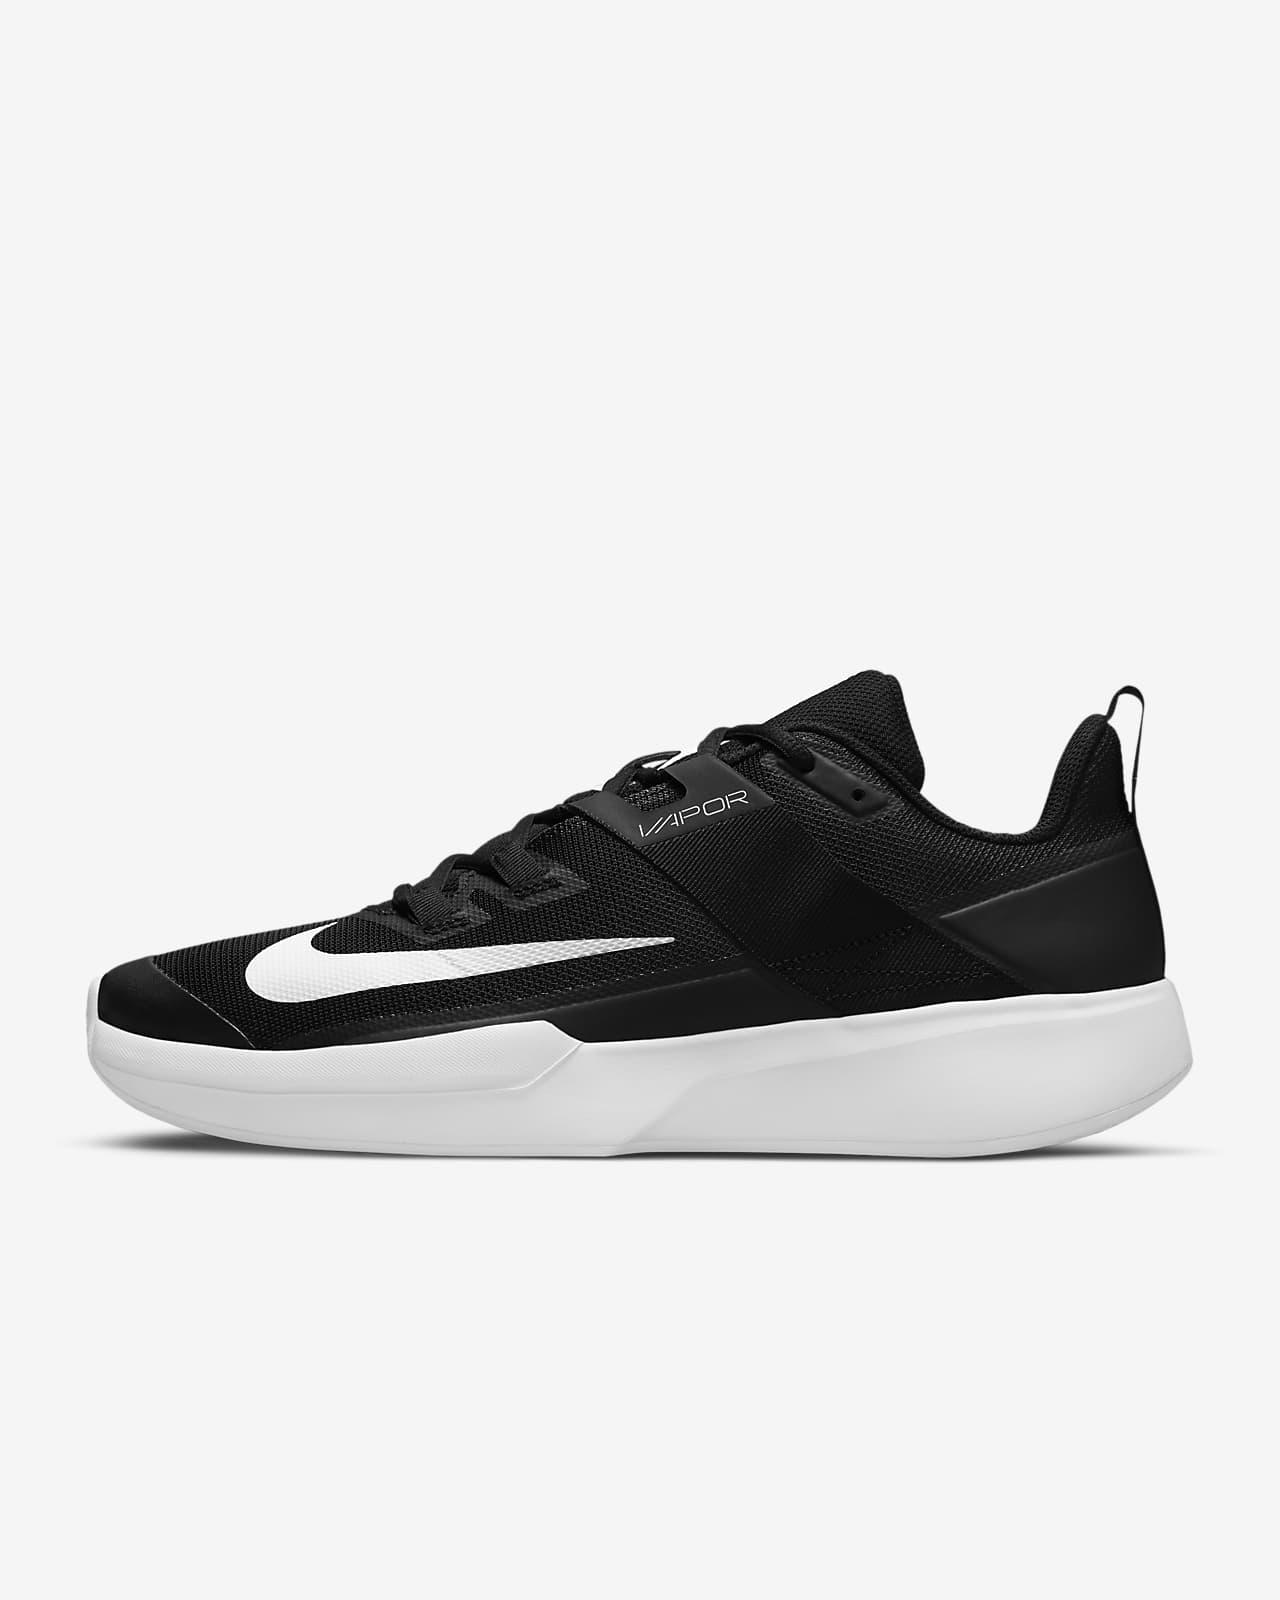 NikeCourt Vapor Lite Men's Clay Court Tennis Shoe